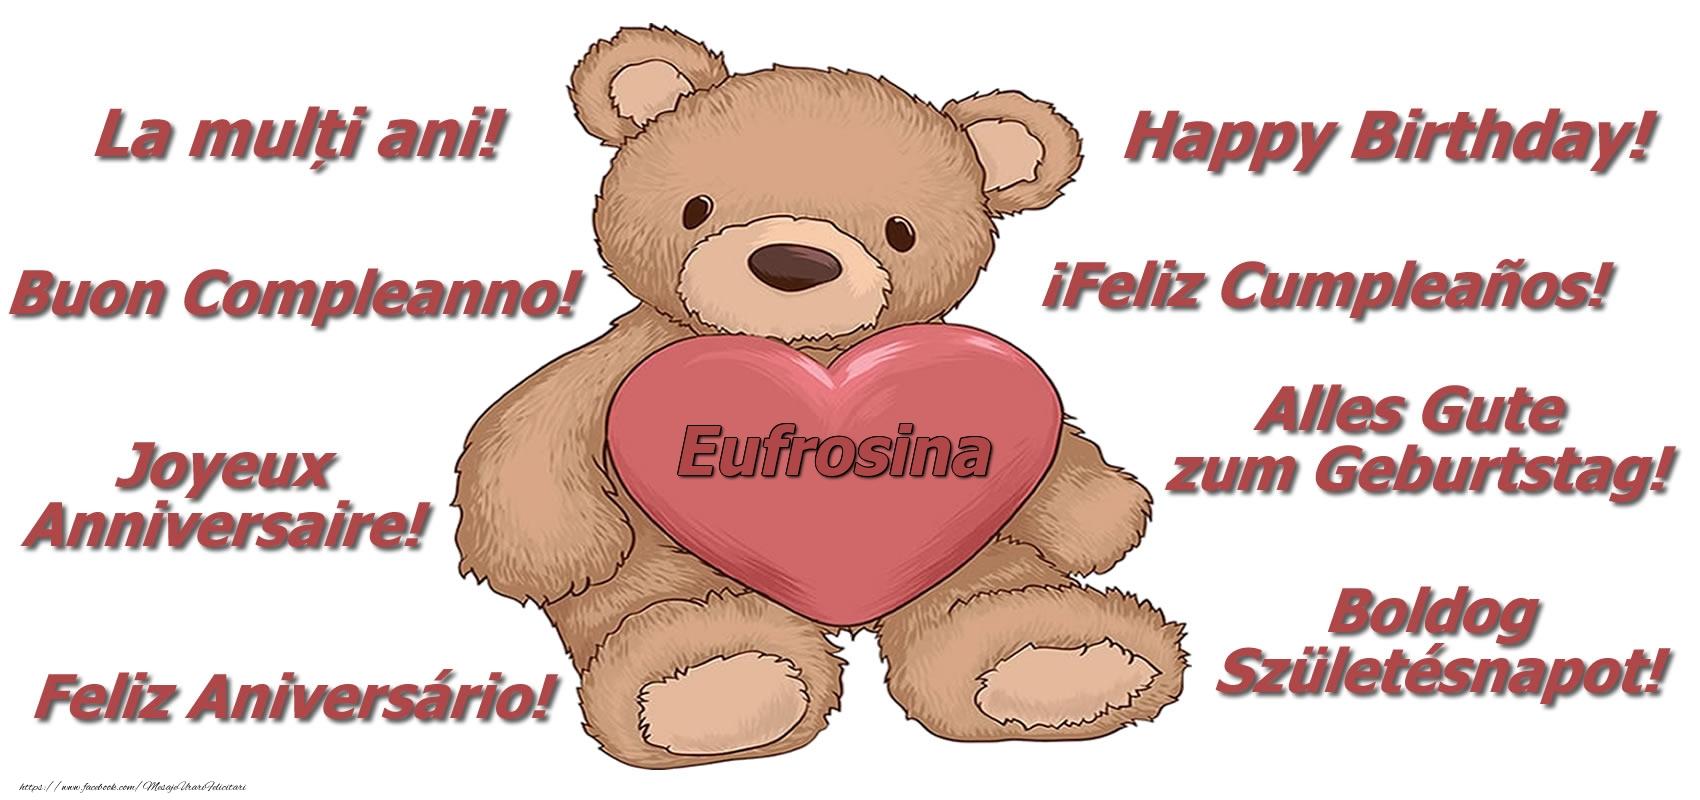 Felicitari de zi de nastere - La multi ani Eufrosina! - Ursulet